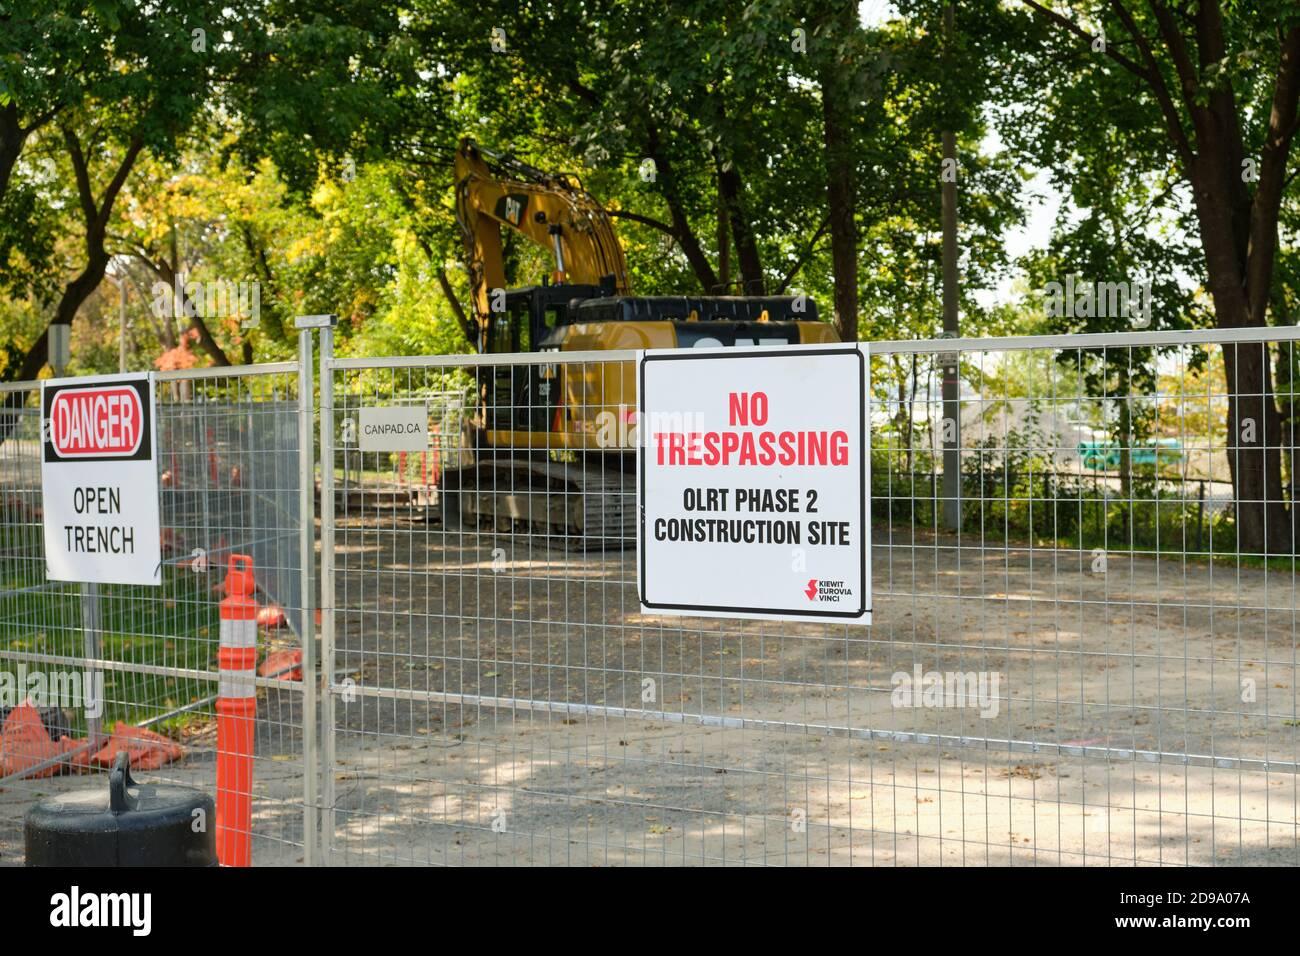 No Trespassing sign on fence at entrance of OLRT Phase 2, construction site. Ottawa, Canada. September 25, 2020 Stock Photo